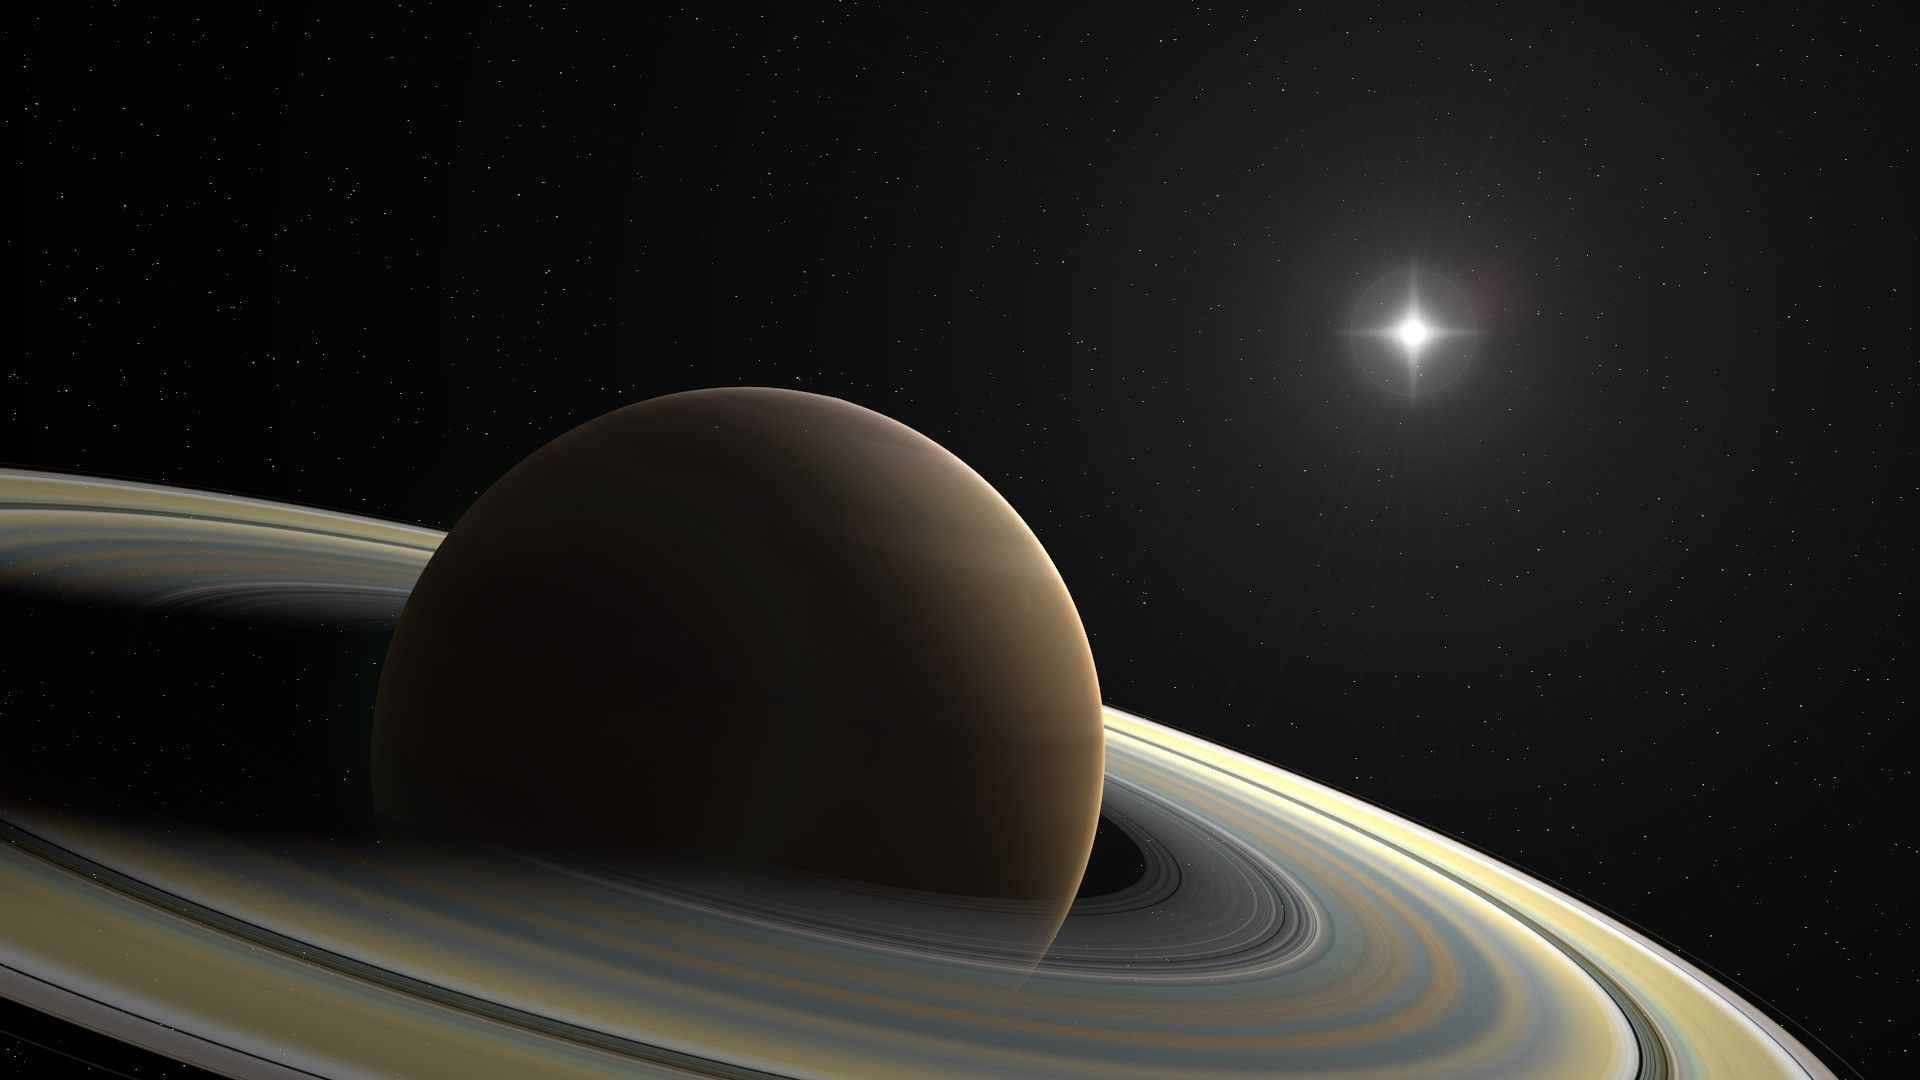 hd neptune planet rings - photo #21